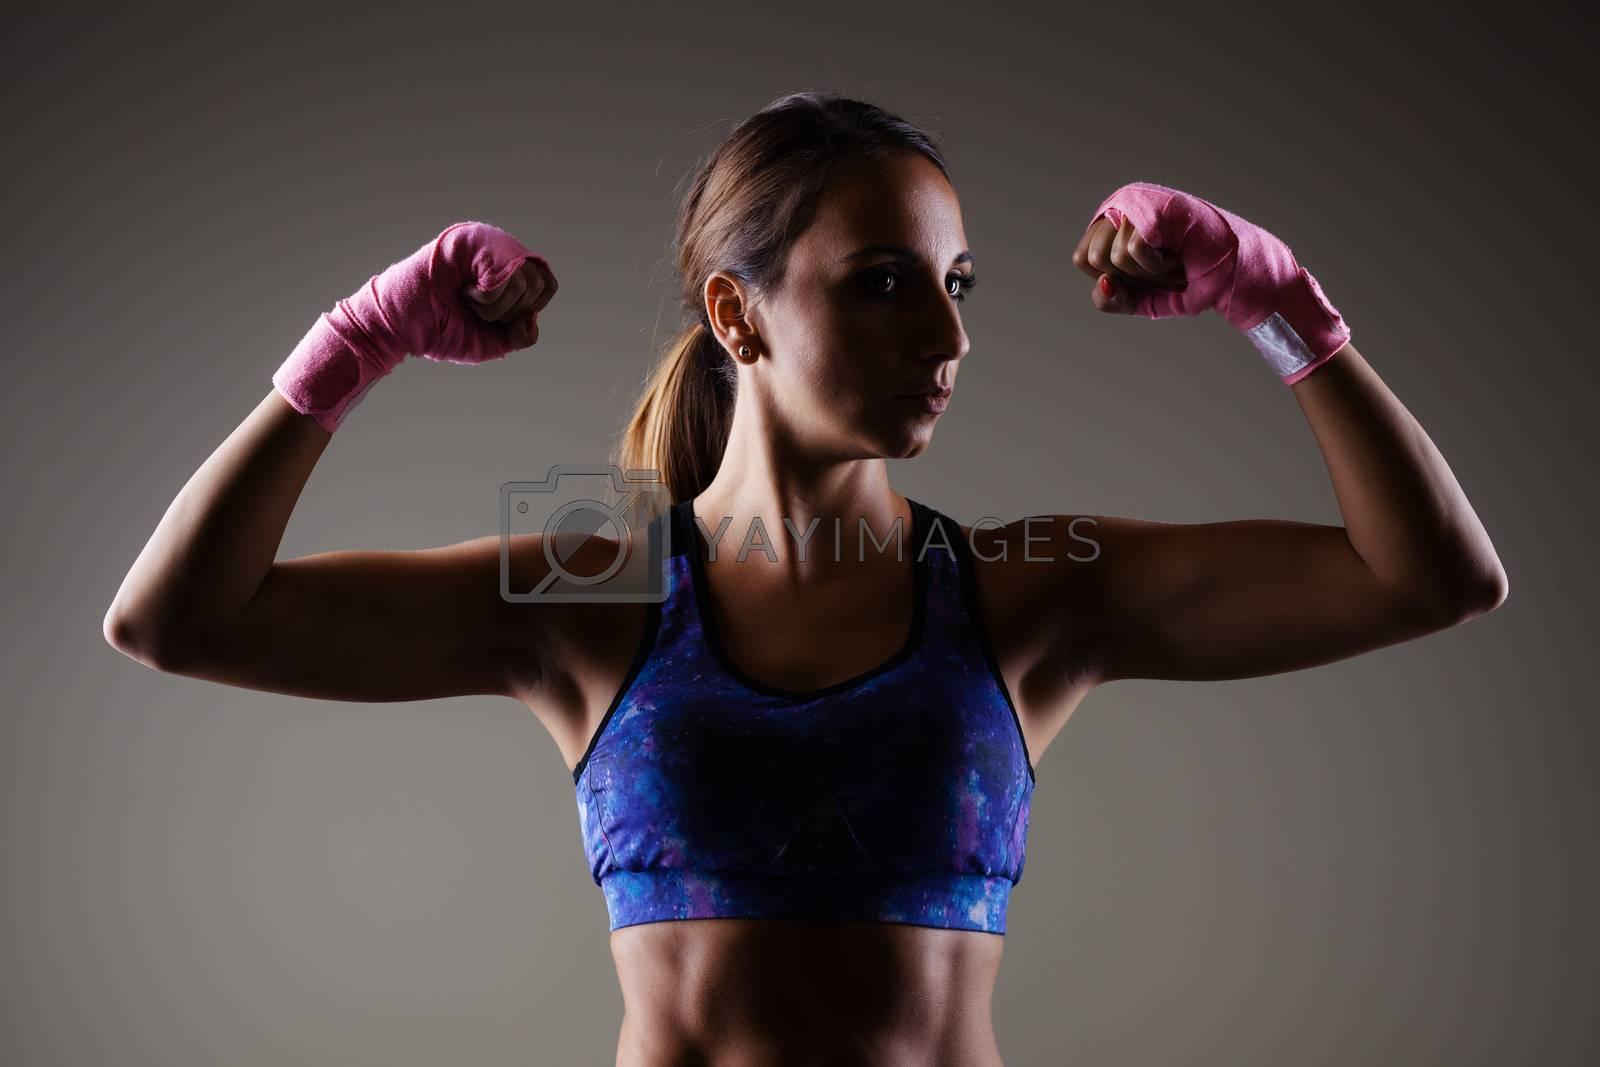 girl kickboxer posing with pink hand wraps